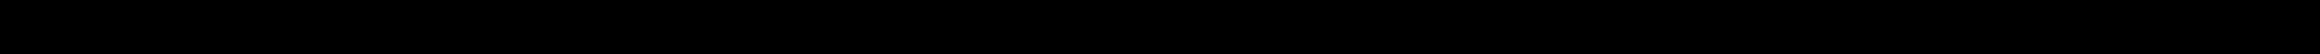 STARK SKSP-1990032, SKSP-1990032, SKSP-1990032, SKSP-1990032, SKSP-1990032 Μπουζί